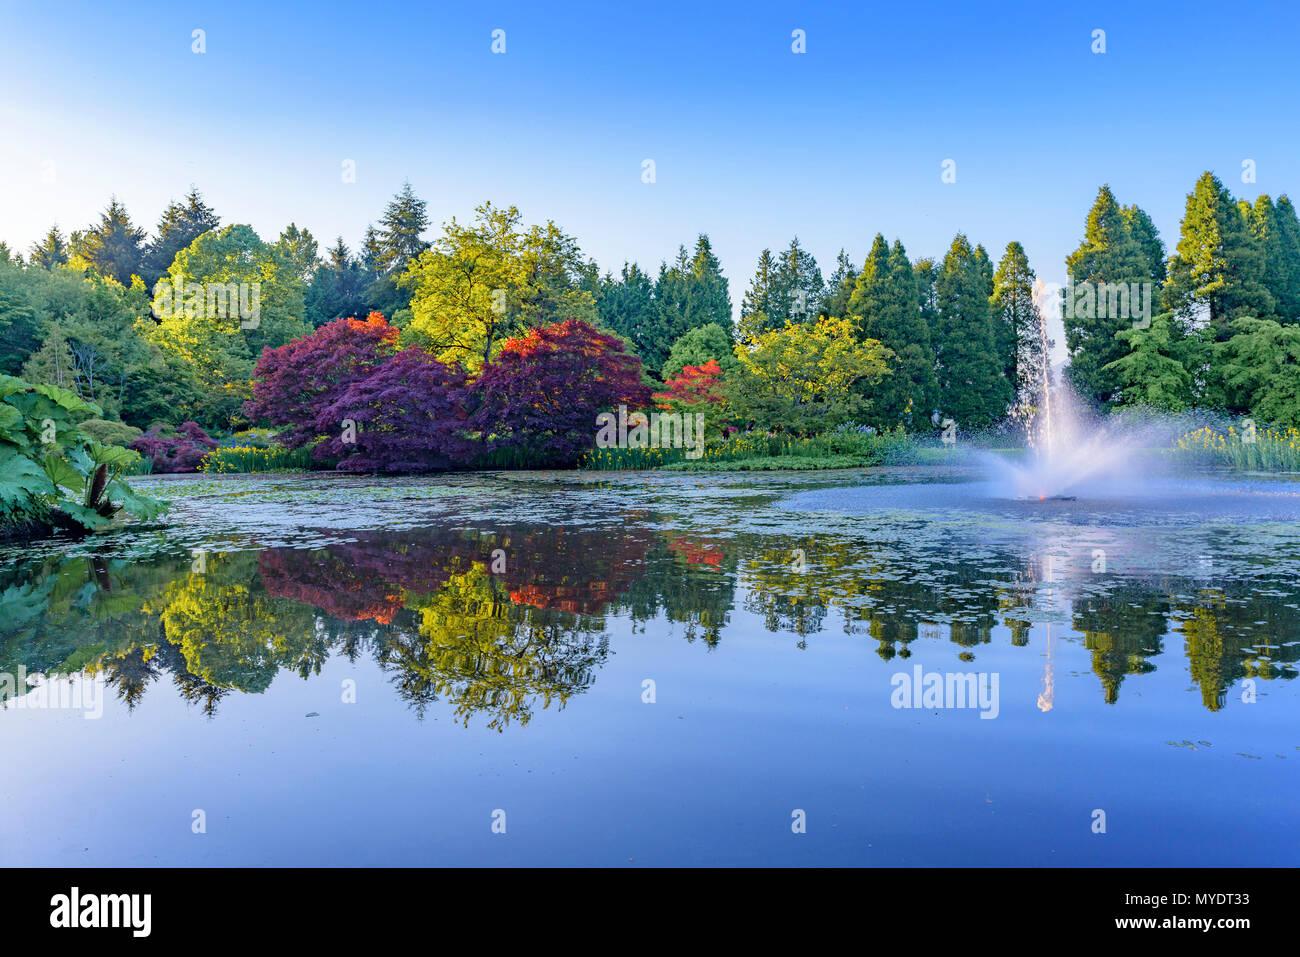 Teich mit Springbrunnen, VanDusen Botanical Garden, Vancouver, British Columbia, Kanada. Stockfoto